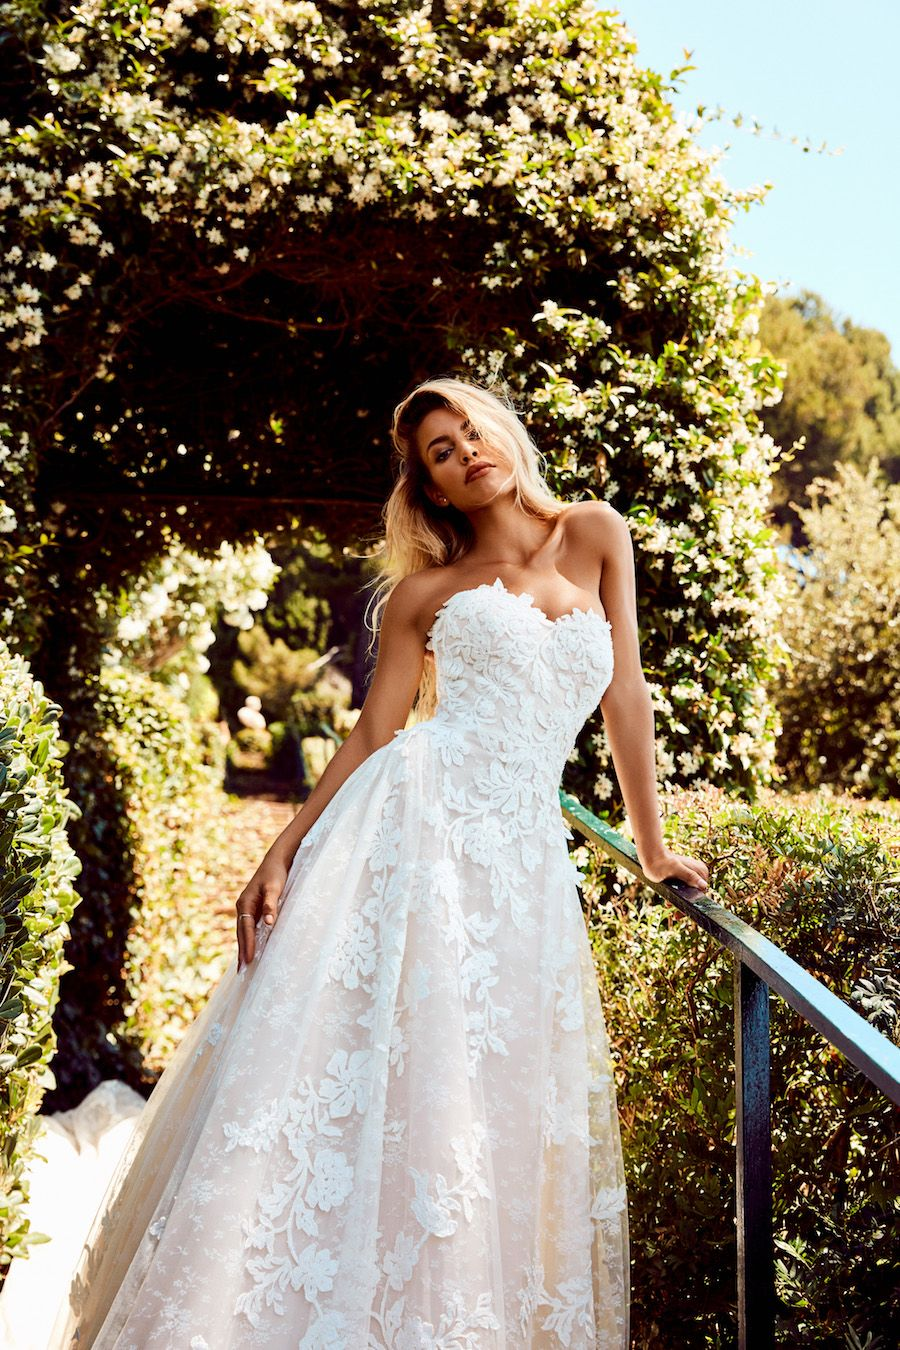 4d59767951 Ballgown wedding dress with sweetheart neckline and lace. Studio St Patrick  2018 – Zelanka  weddingdress  stpatrickbridal